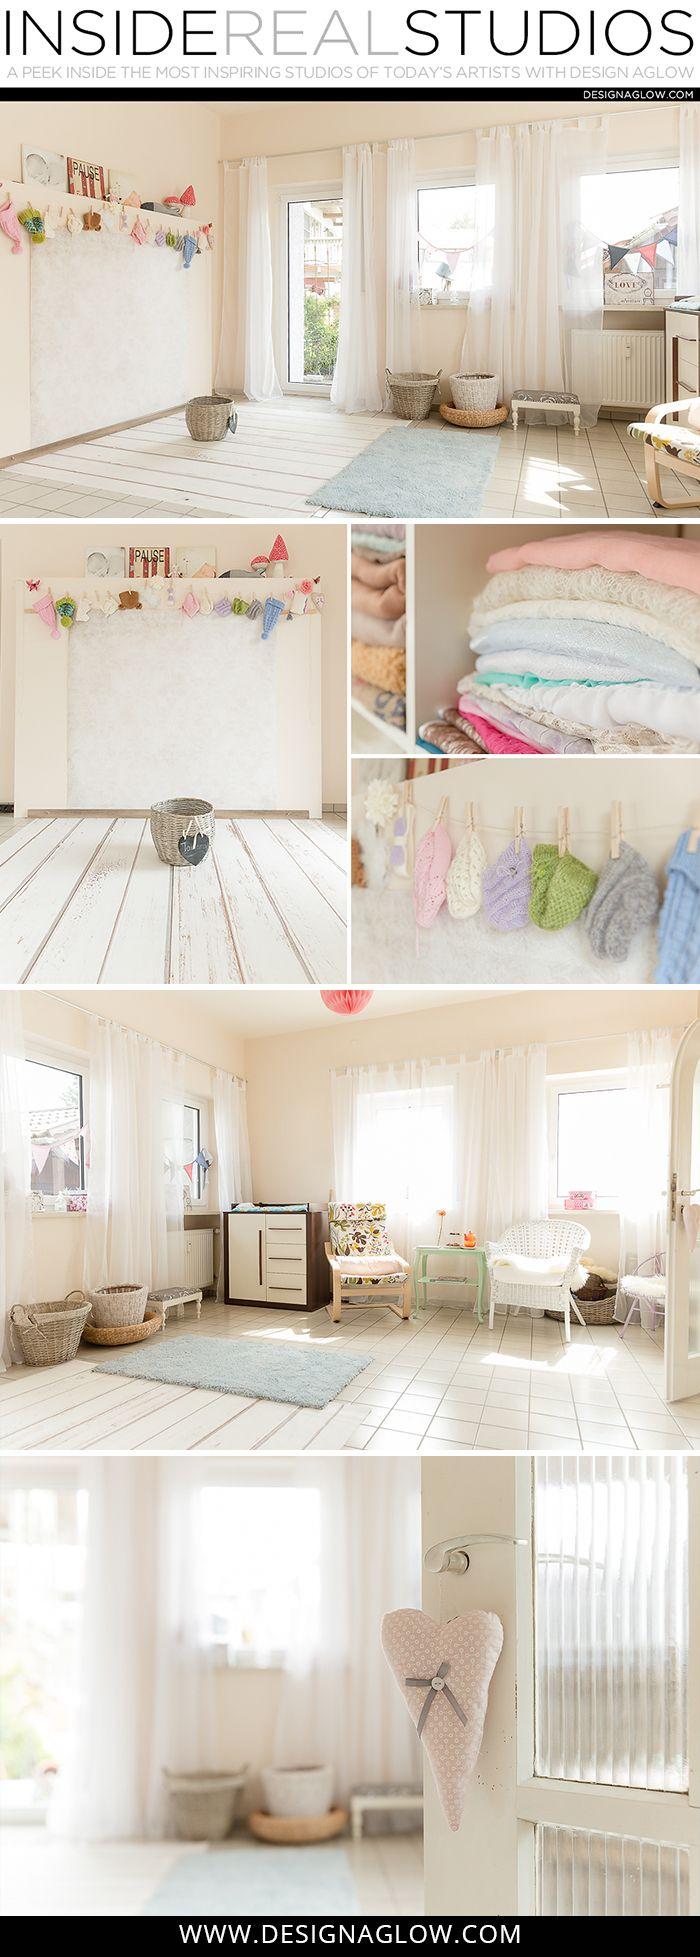 141 best Studio images on Pinterest | Photo studio, Photography ...